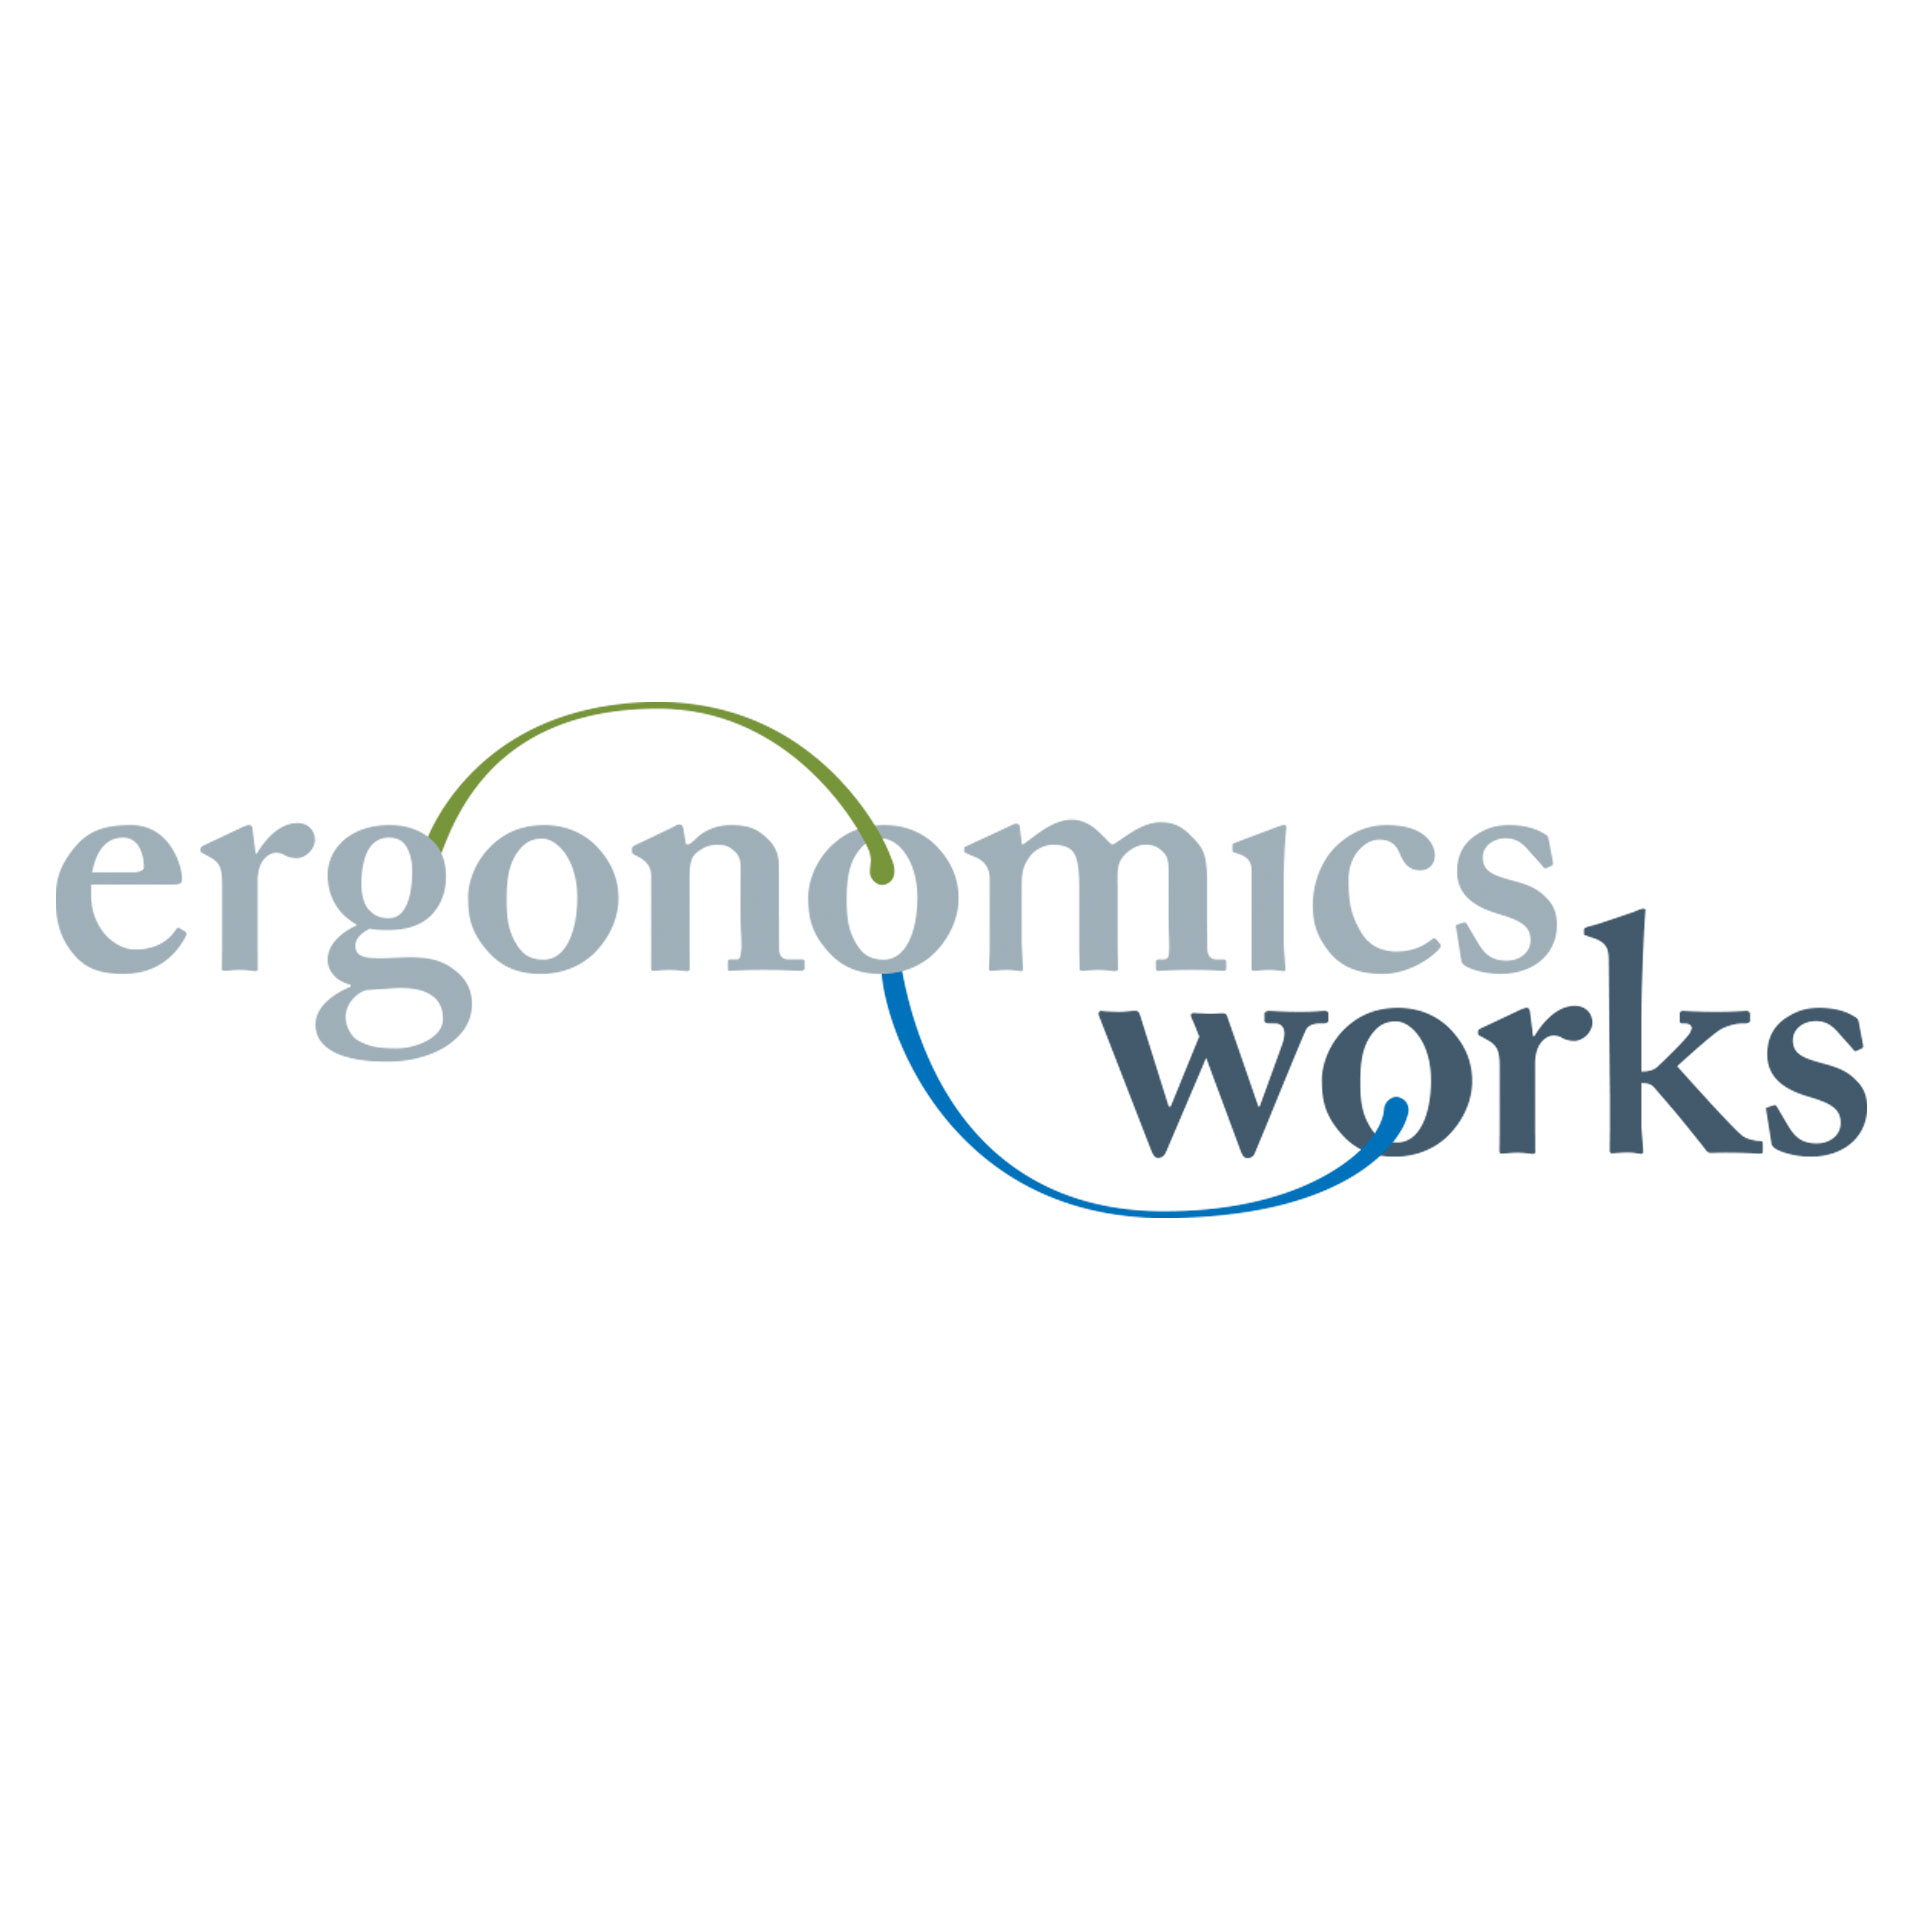 Ergonomics Works branding